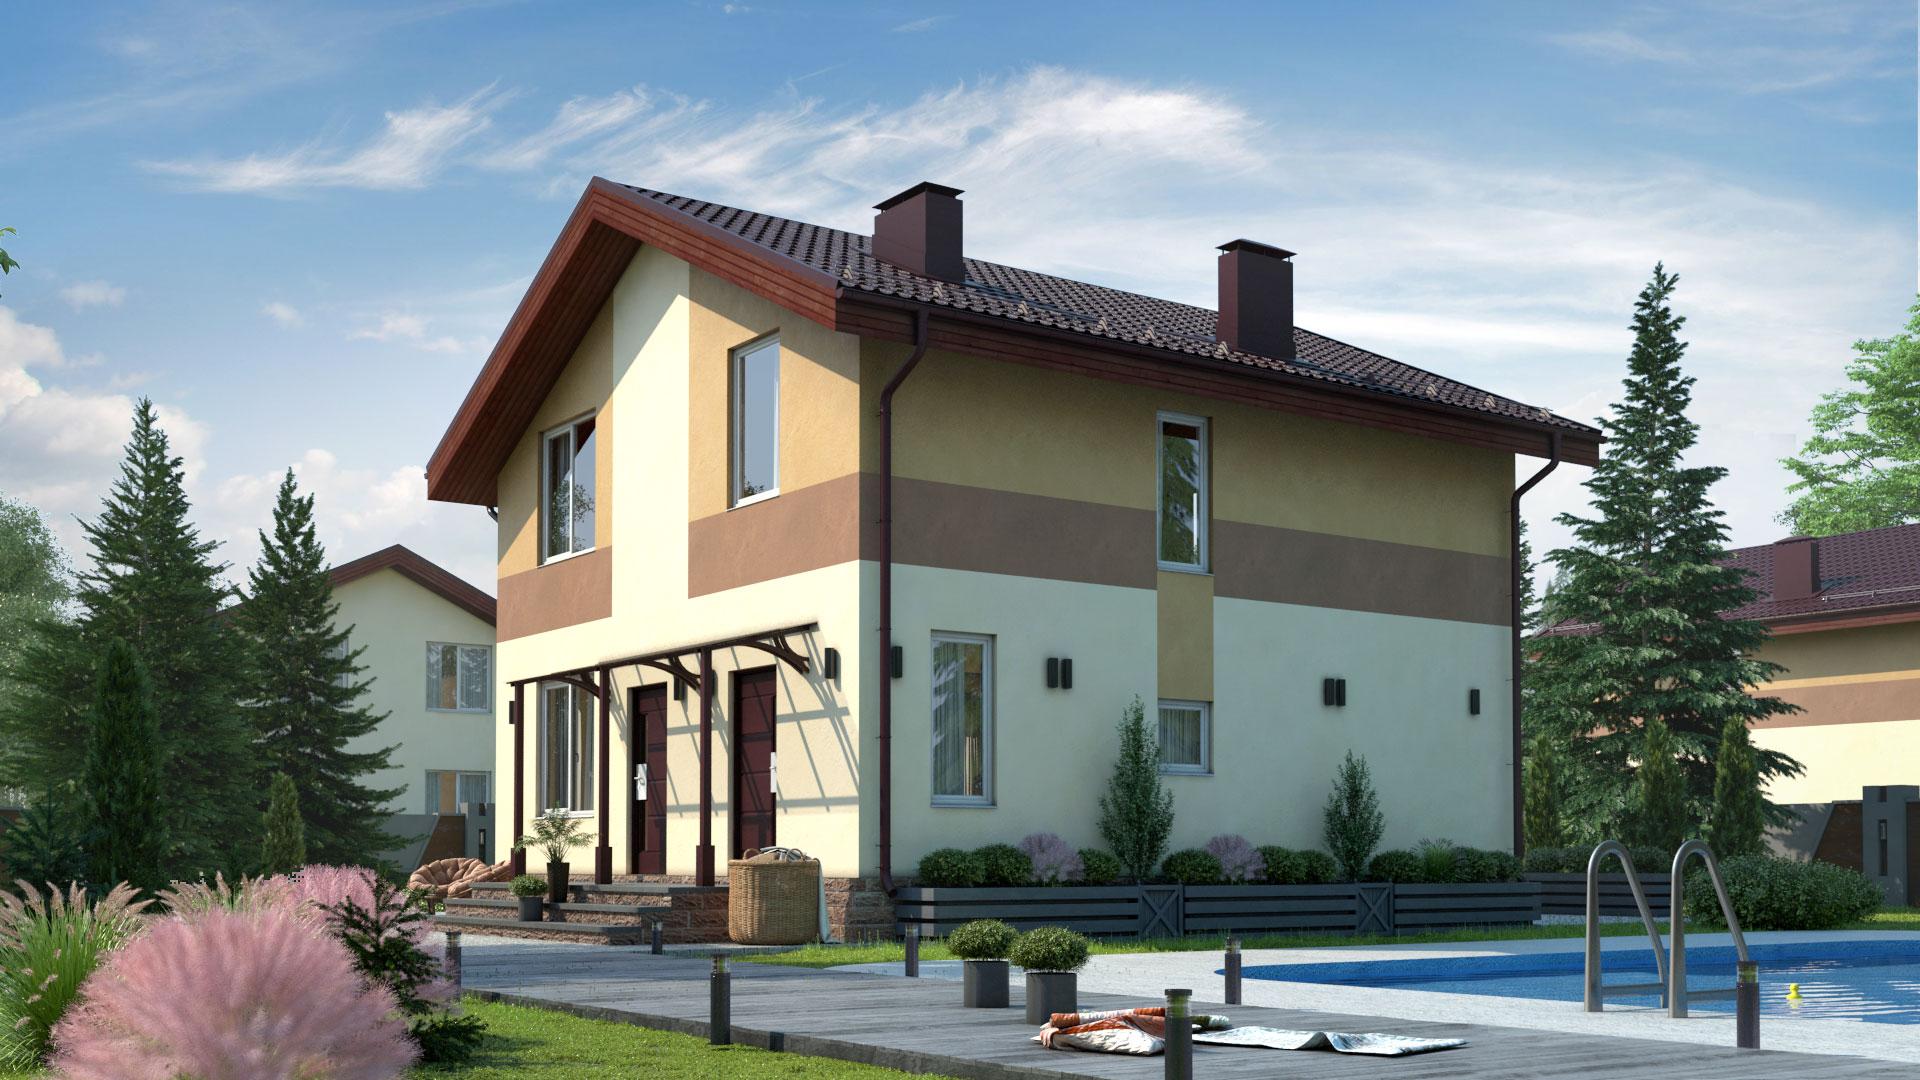 Задний фасад двухэтажного дома 8 на 9 метров. Проект БЭНПАН МС-126/1.